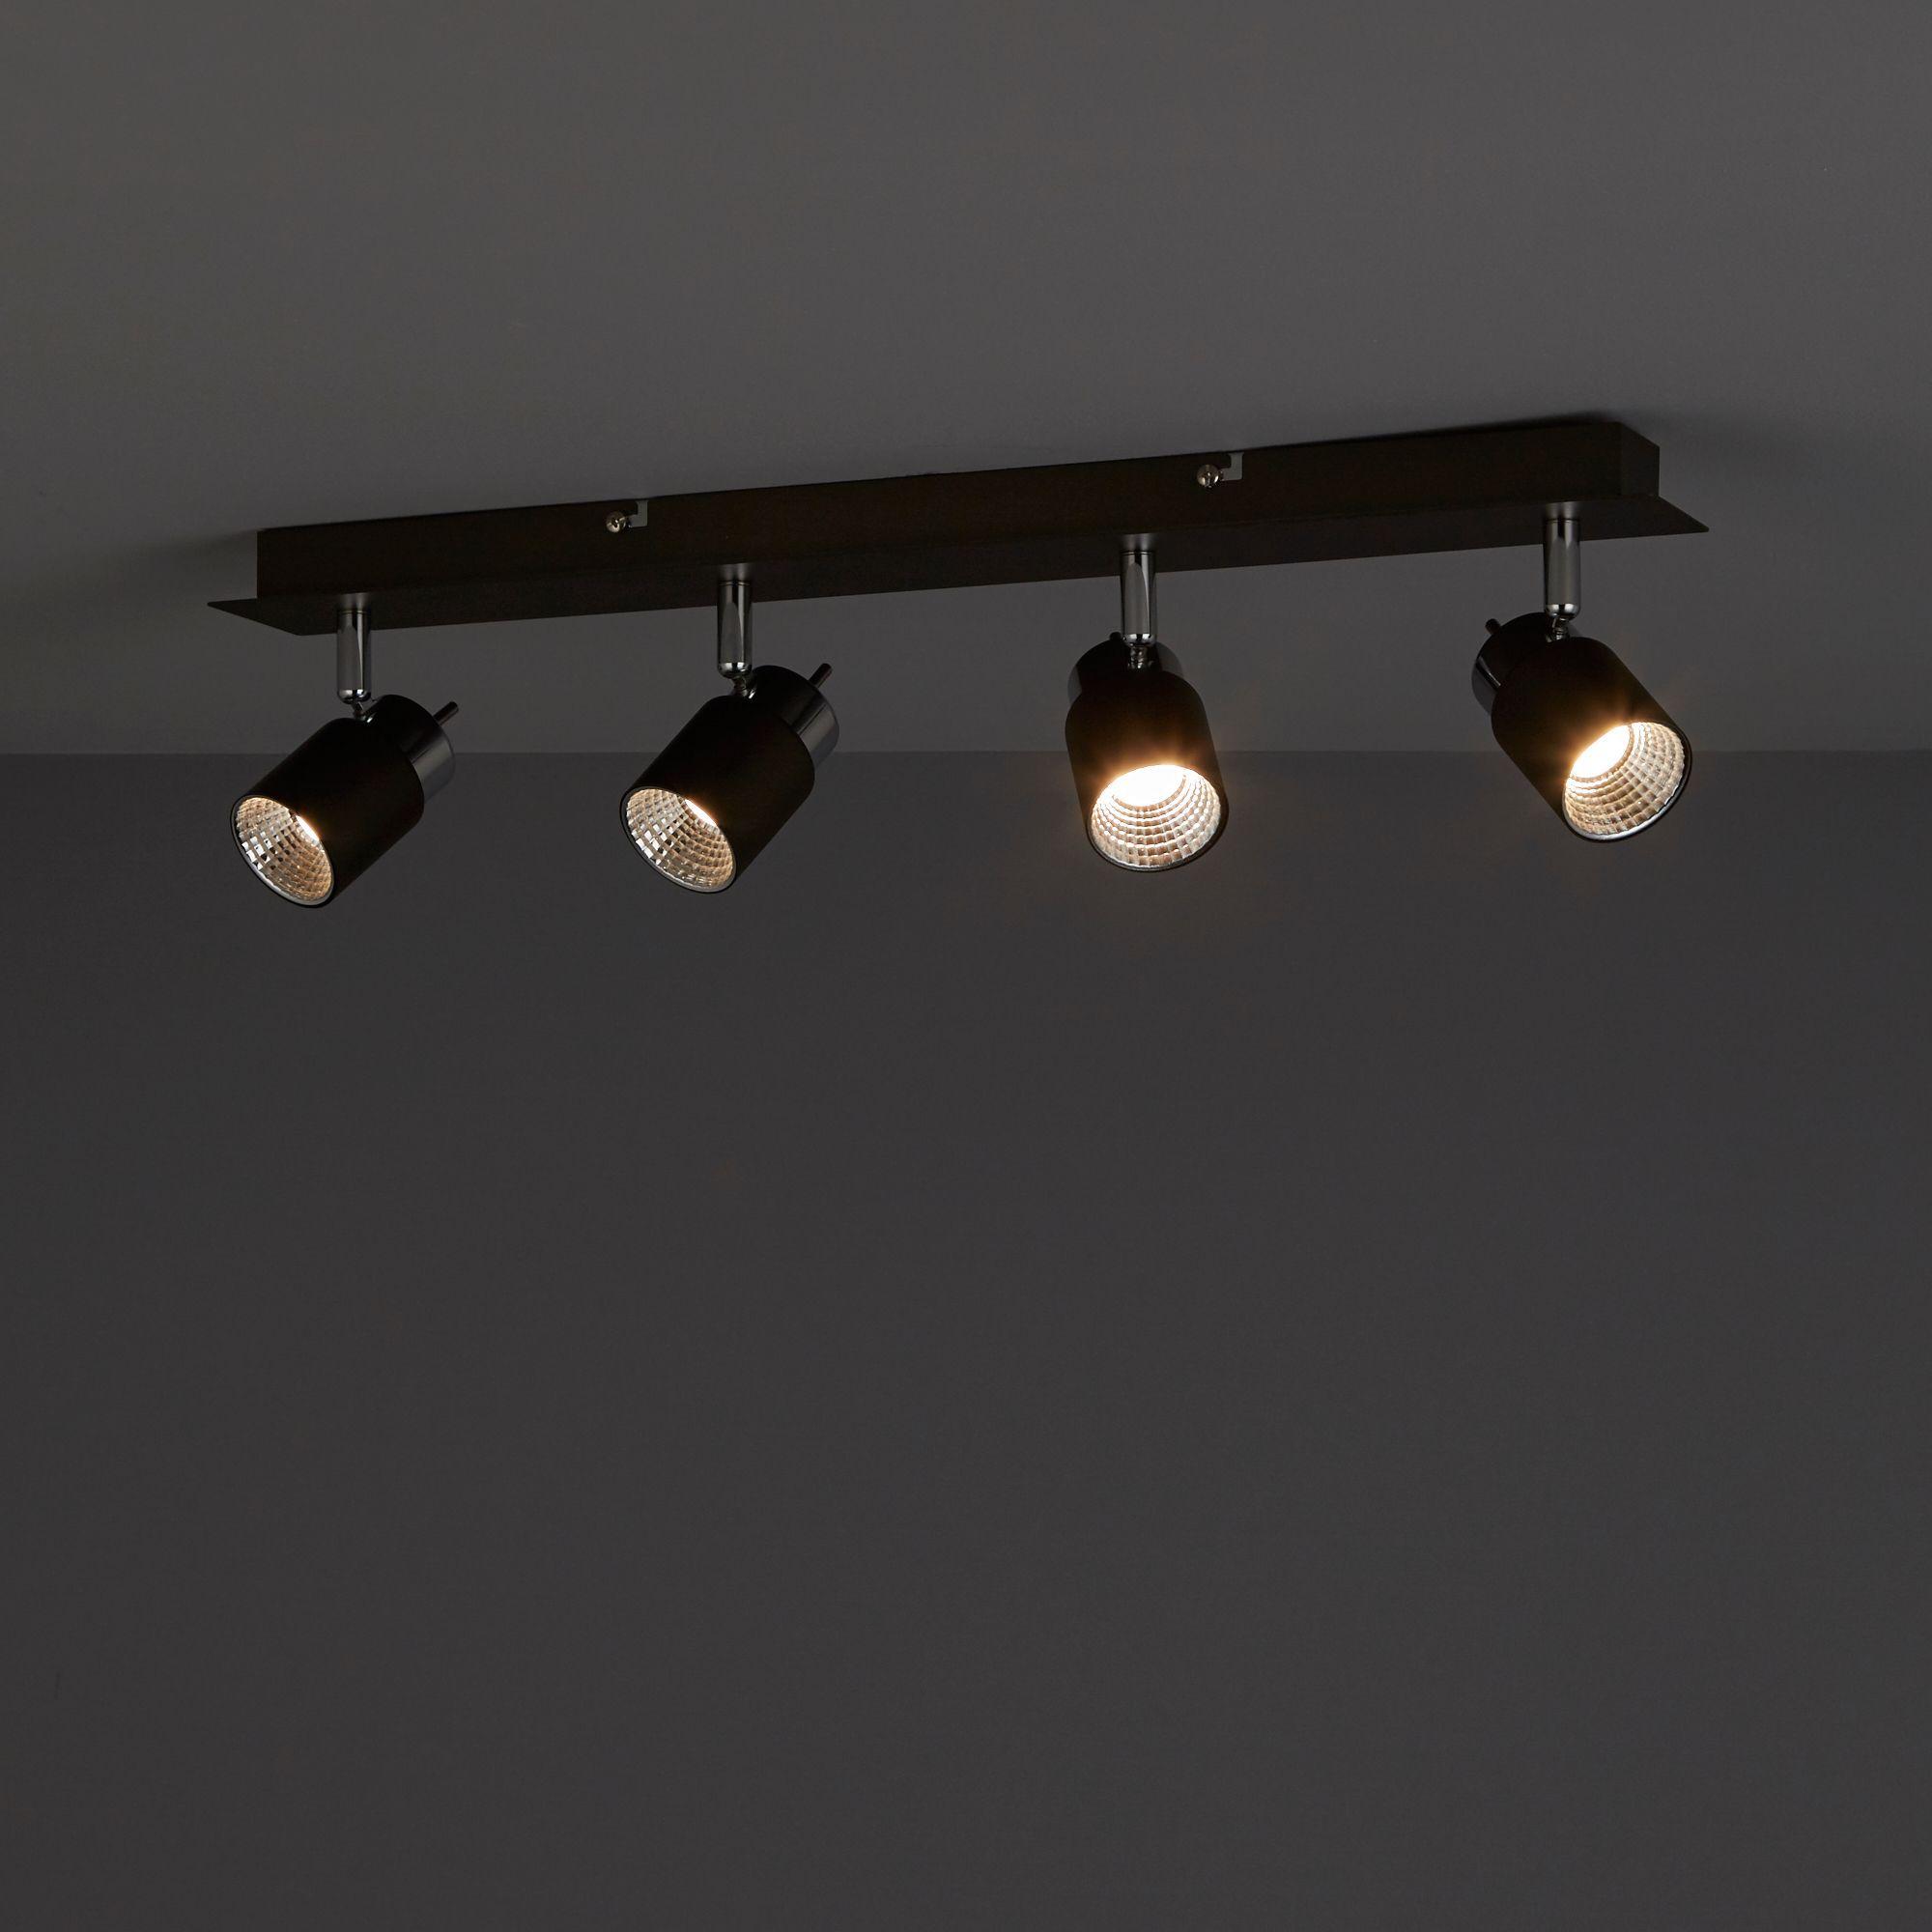 Hades Grey Chrome Effect 4 Lamp Spotlight